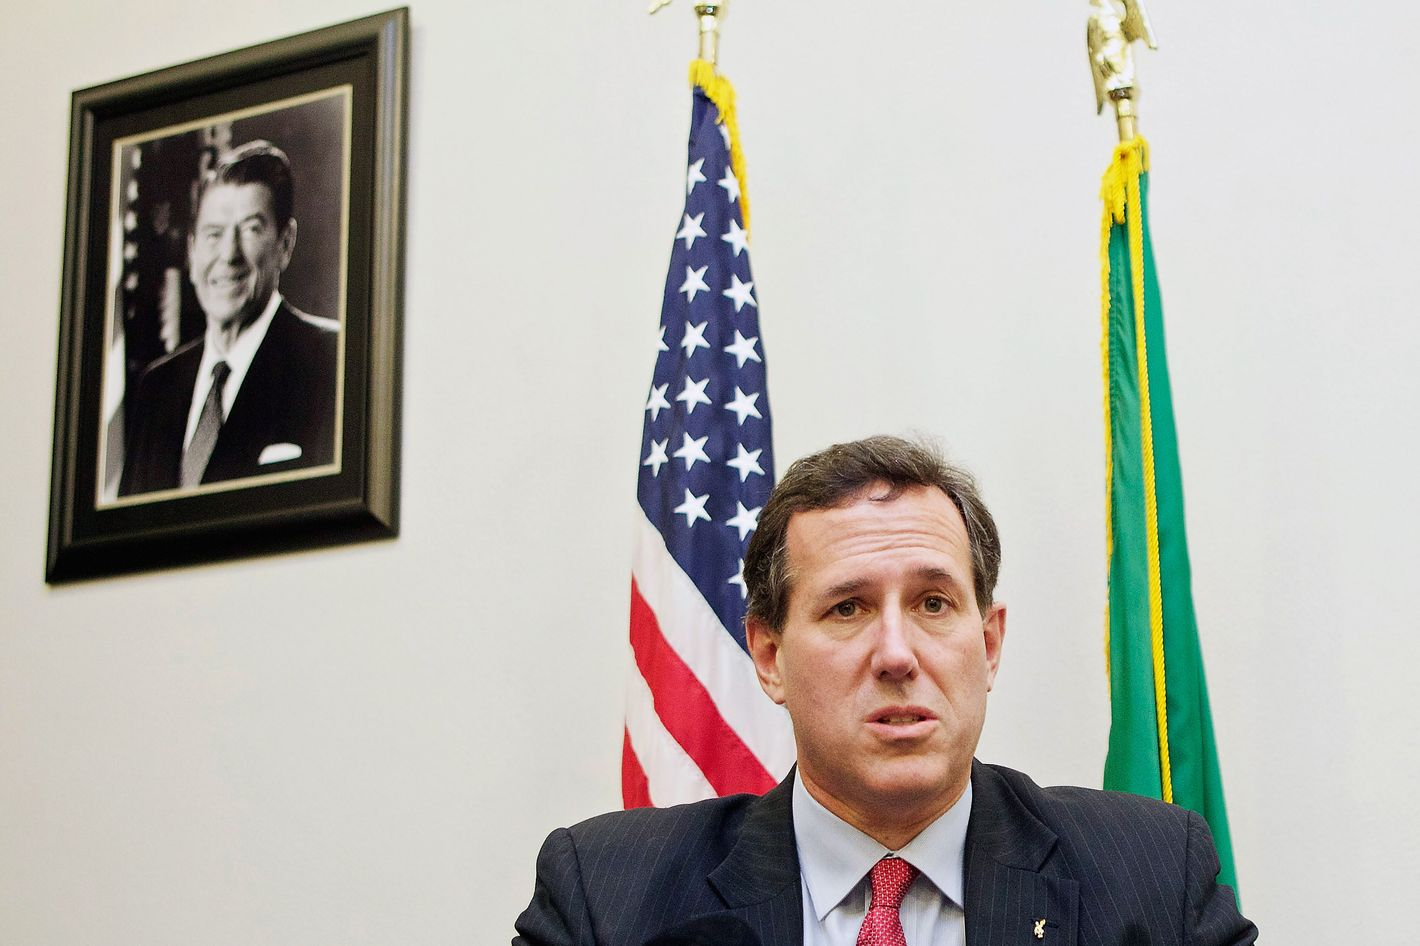 Republican presidential candidate Sen. Rick Santorum speaks to the media February 13, 2012